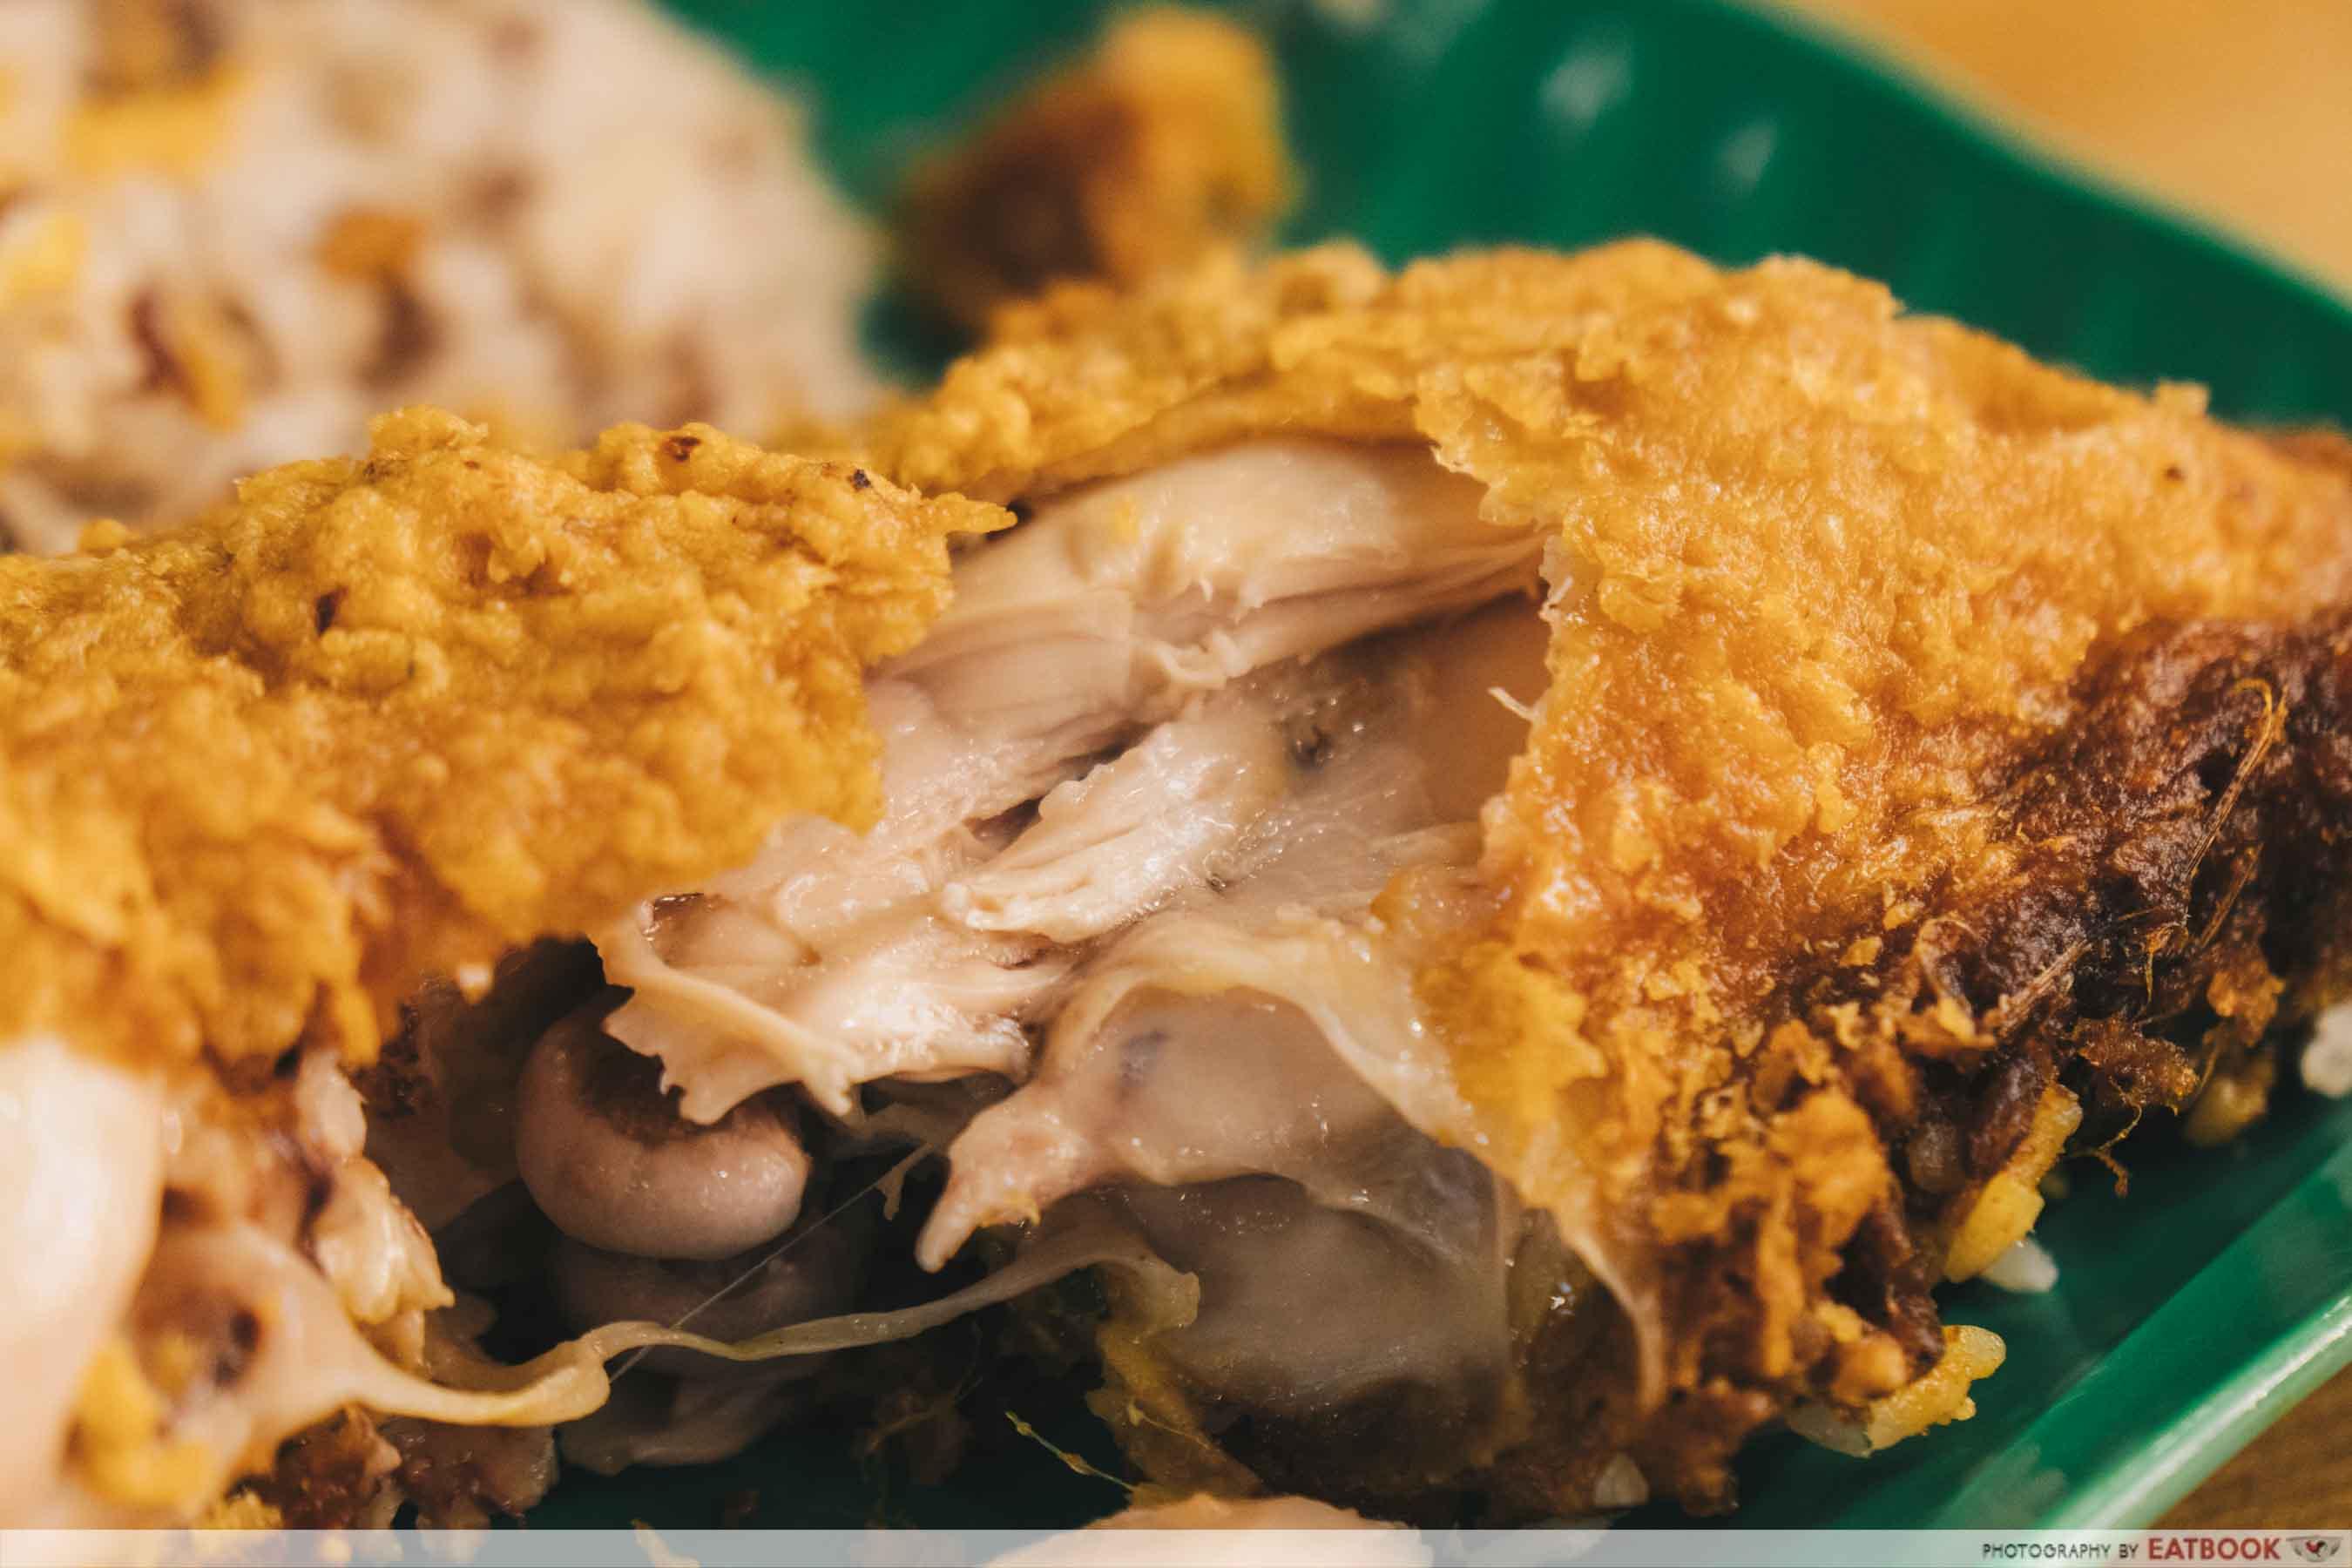 Yes Nasi Kukus fried chicken meat